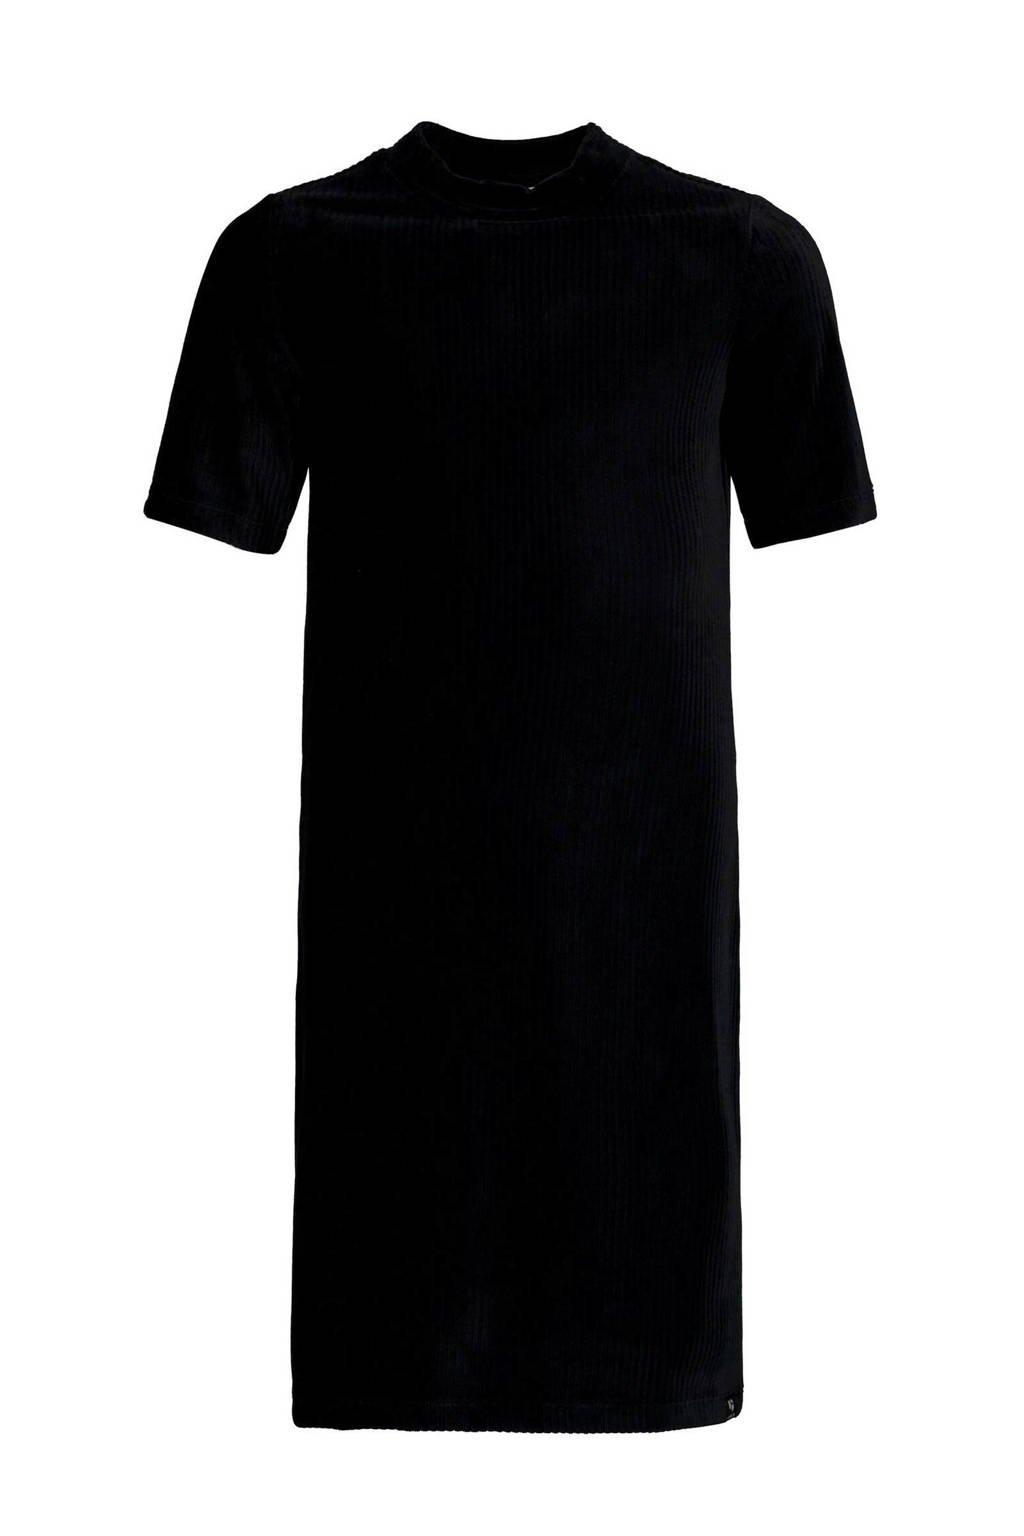 Garcia ribgebreide jurk zwart, Zwart